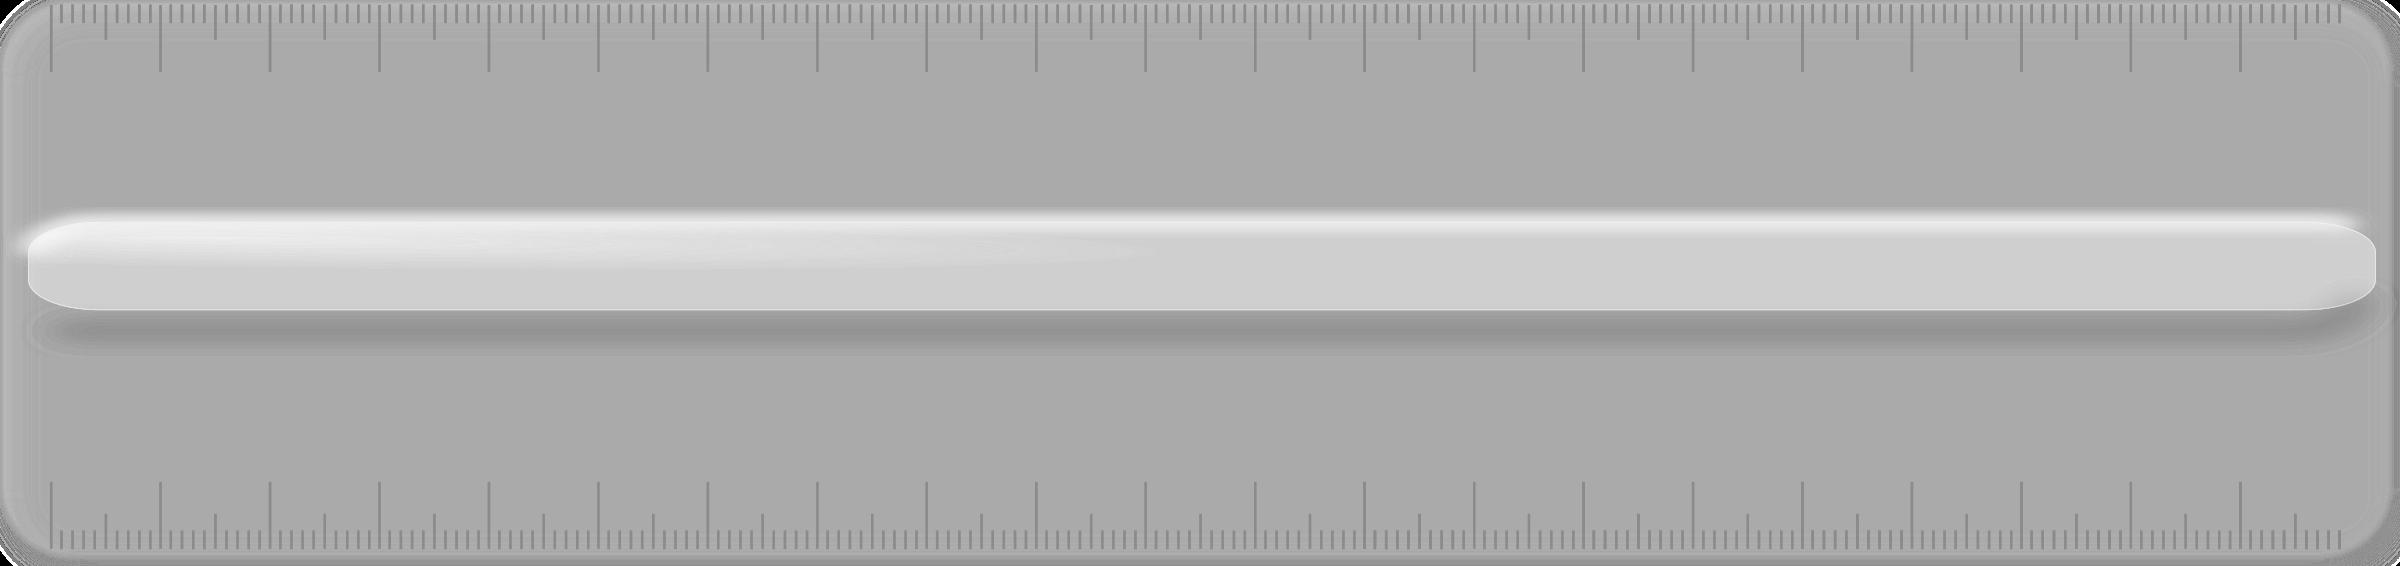 Clipart ruler rule. Plastic big image png